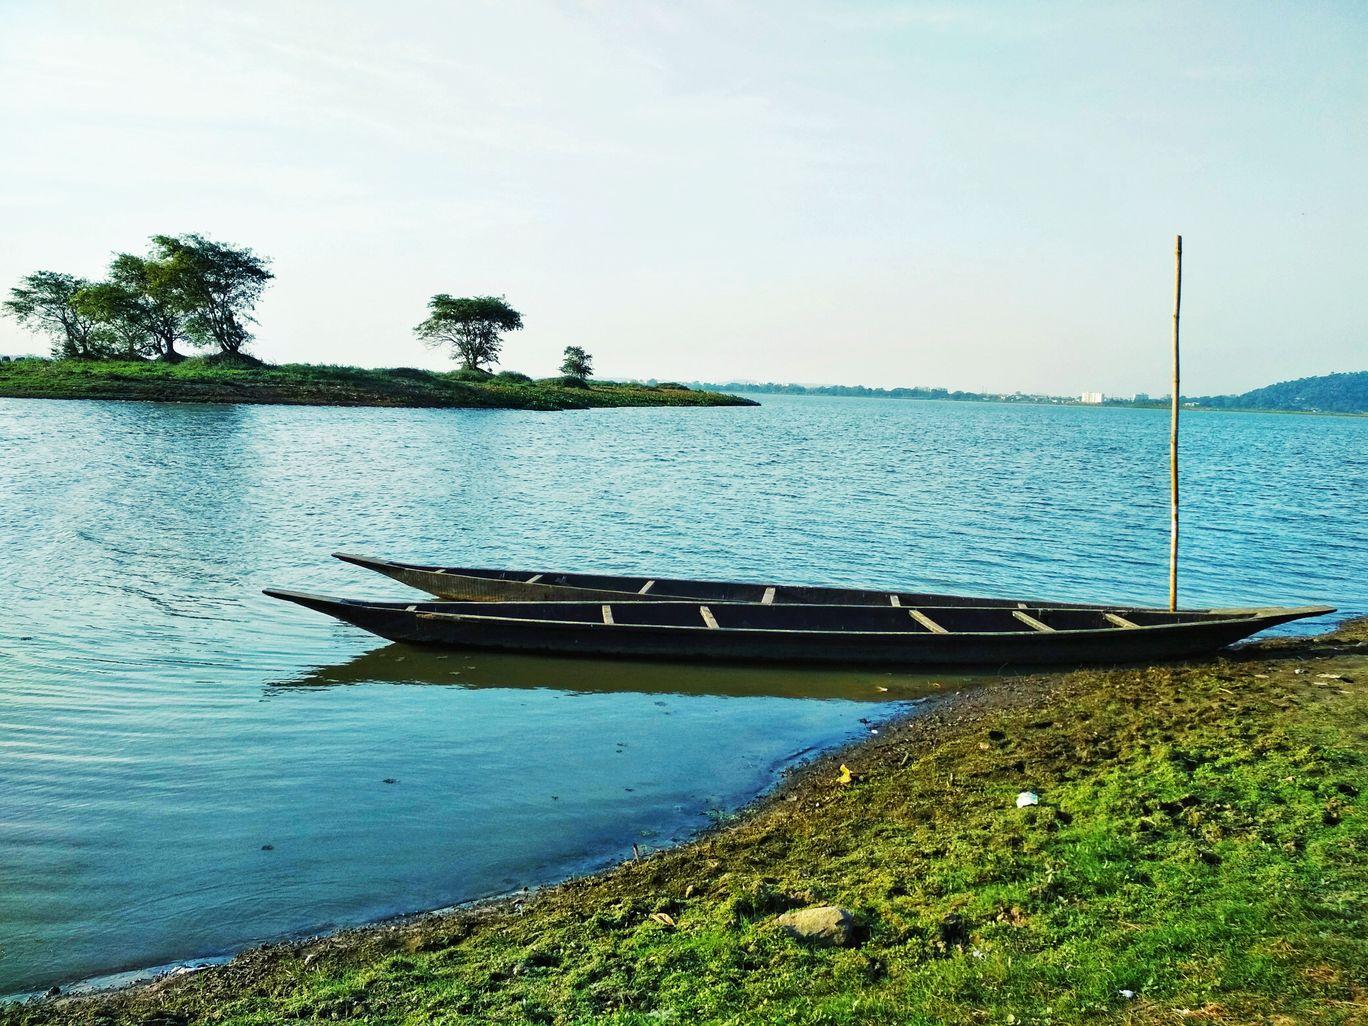 Photo of Northeast India By Minakshi Roy